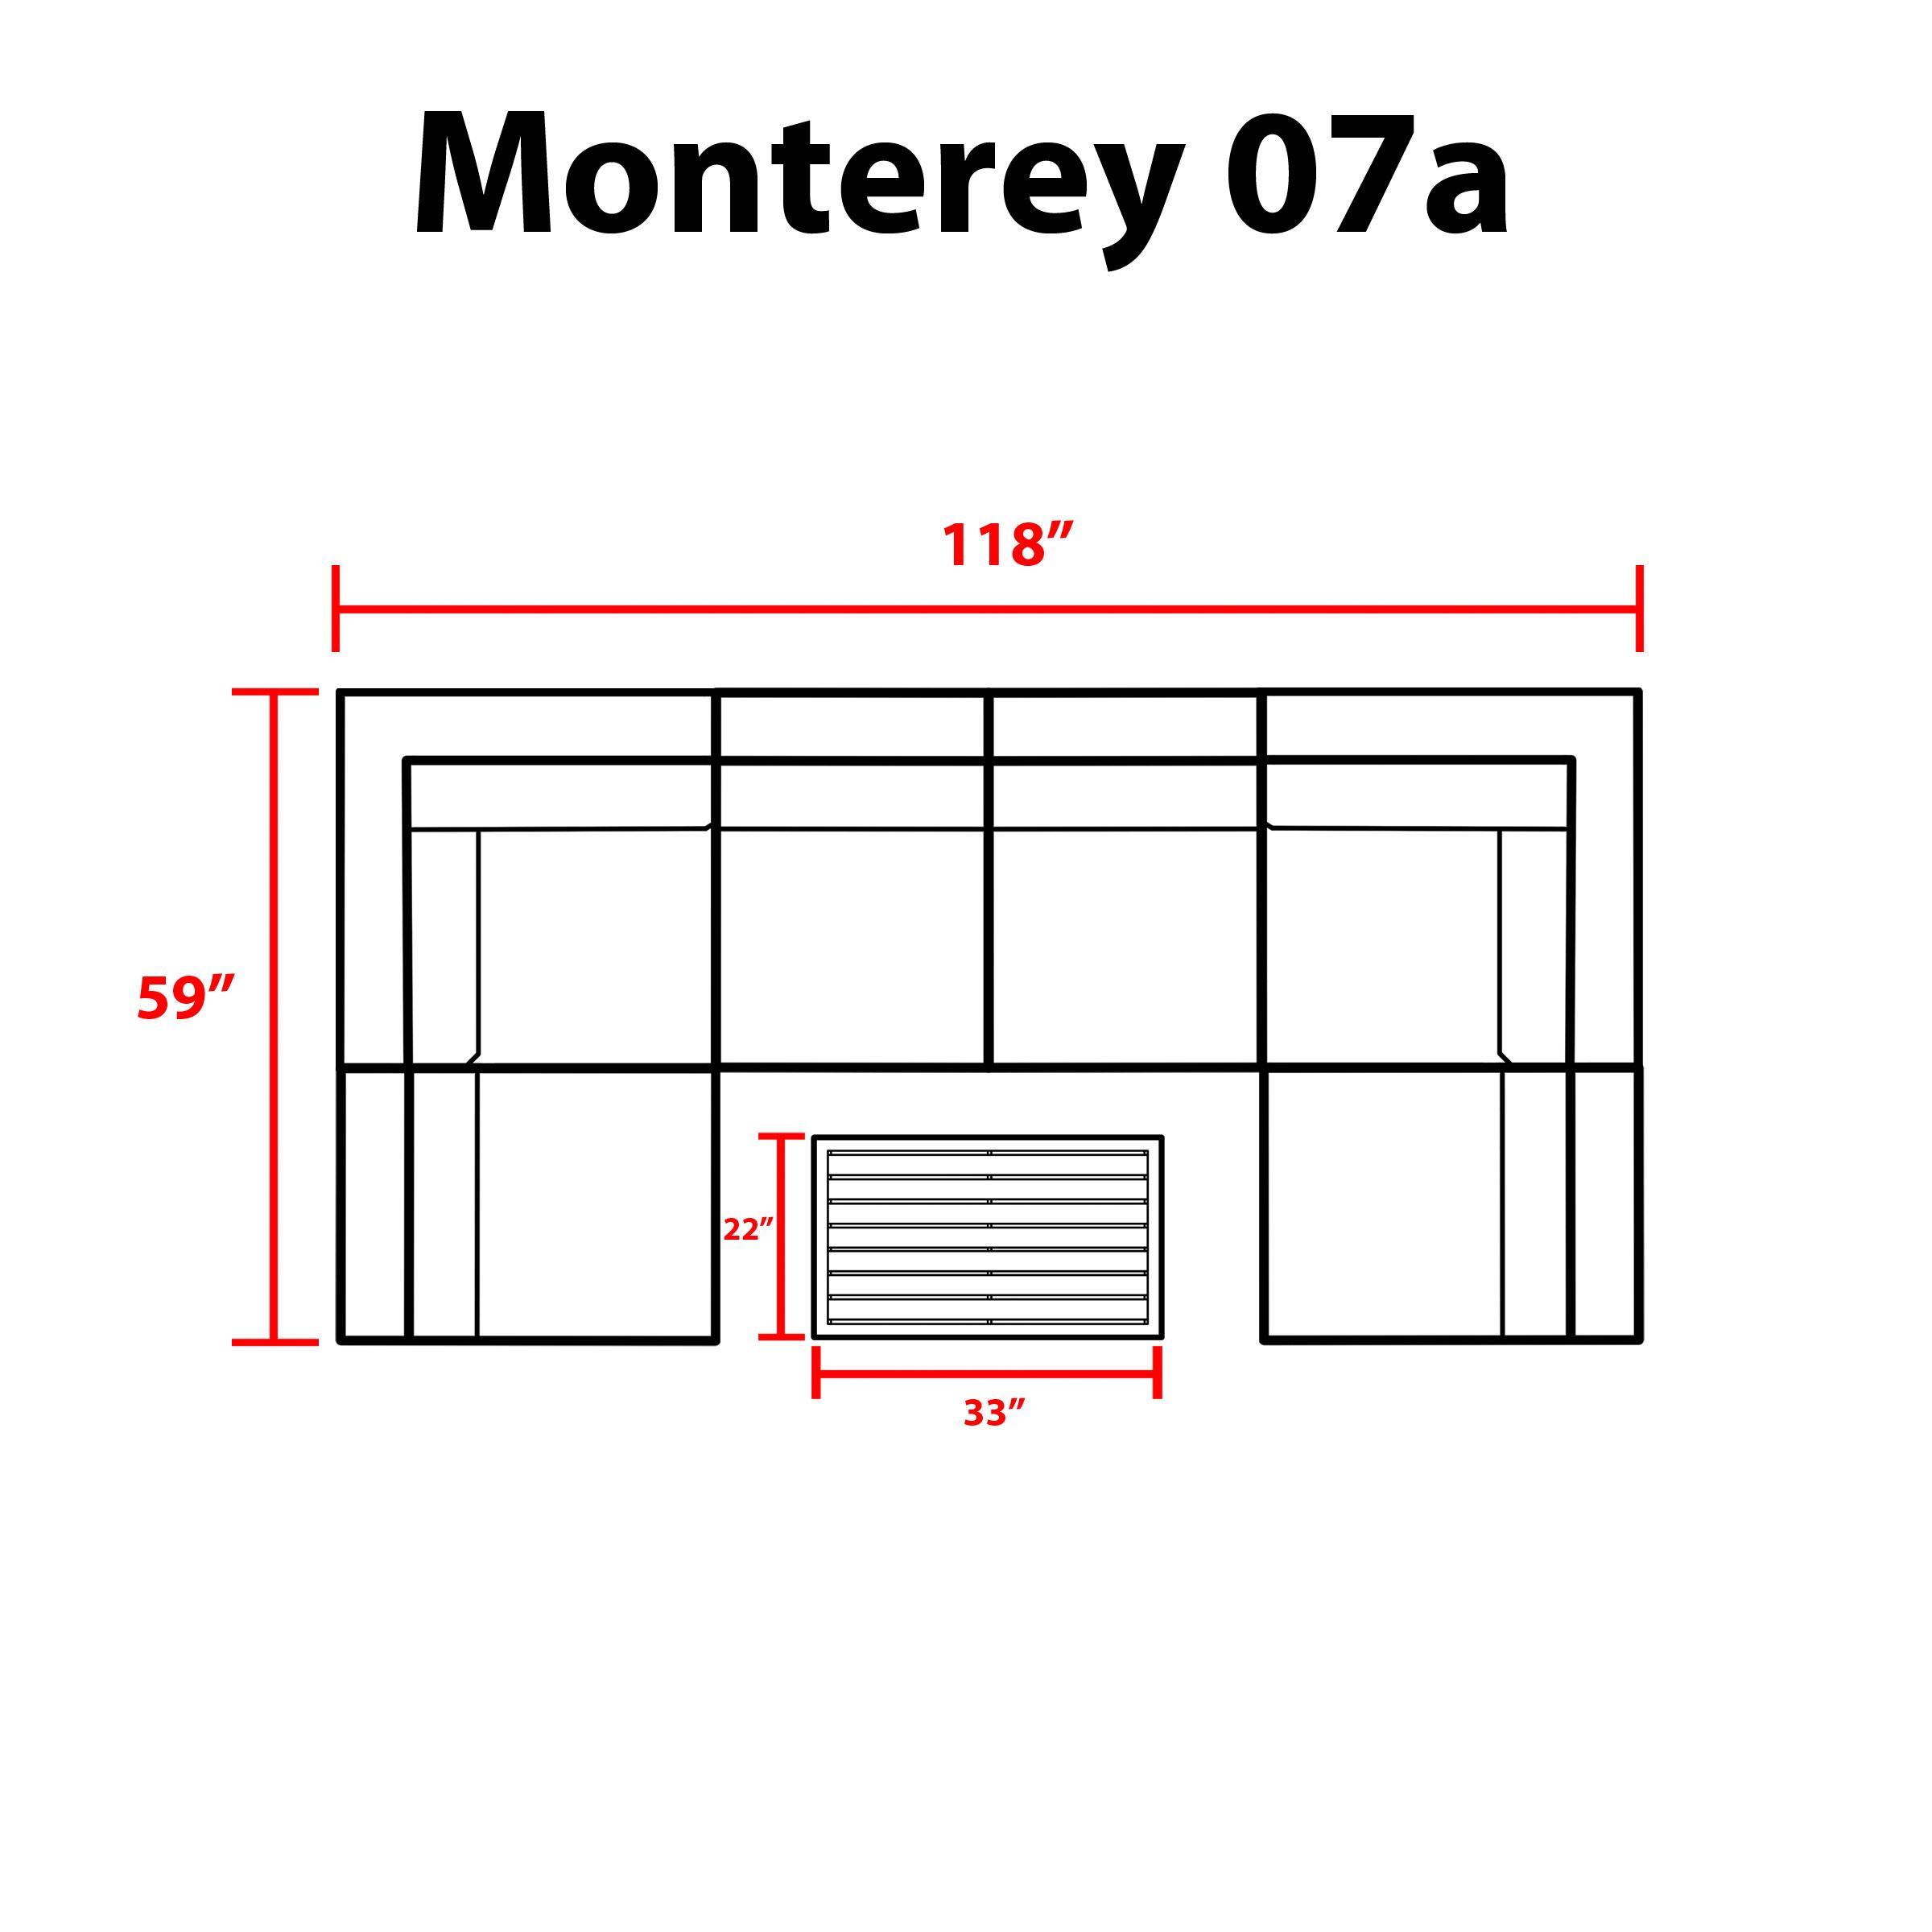 Monterey 7 Piece Outdoor Wicker Patio Furniture Set 07a -